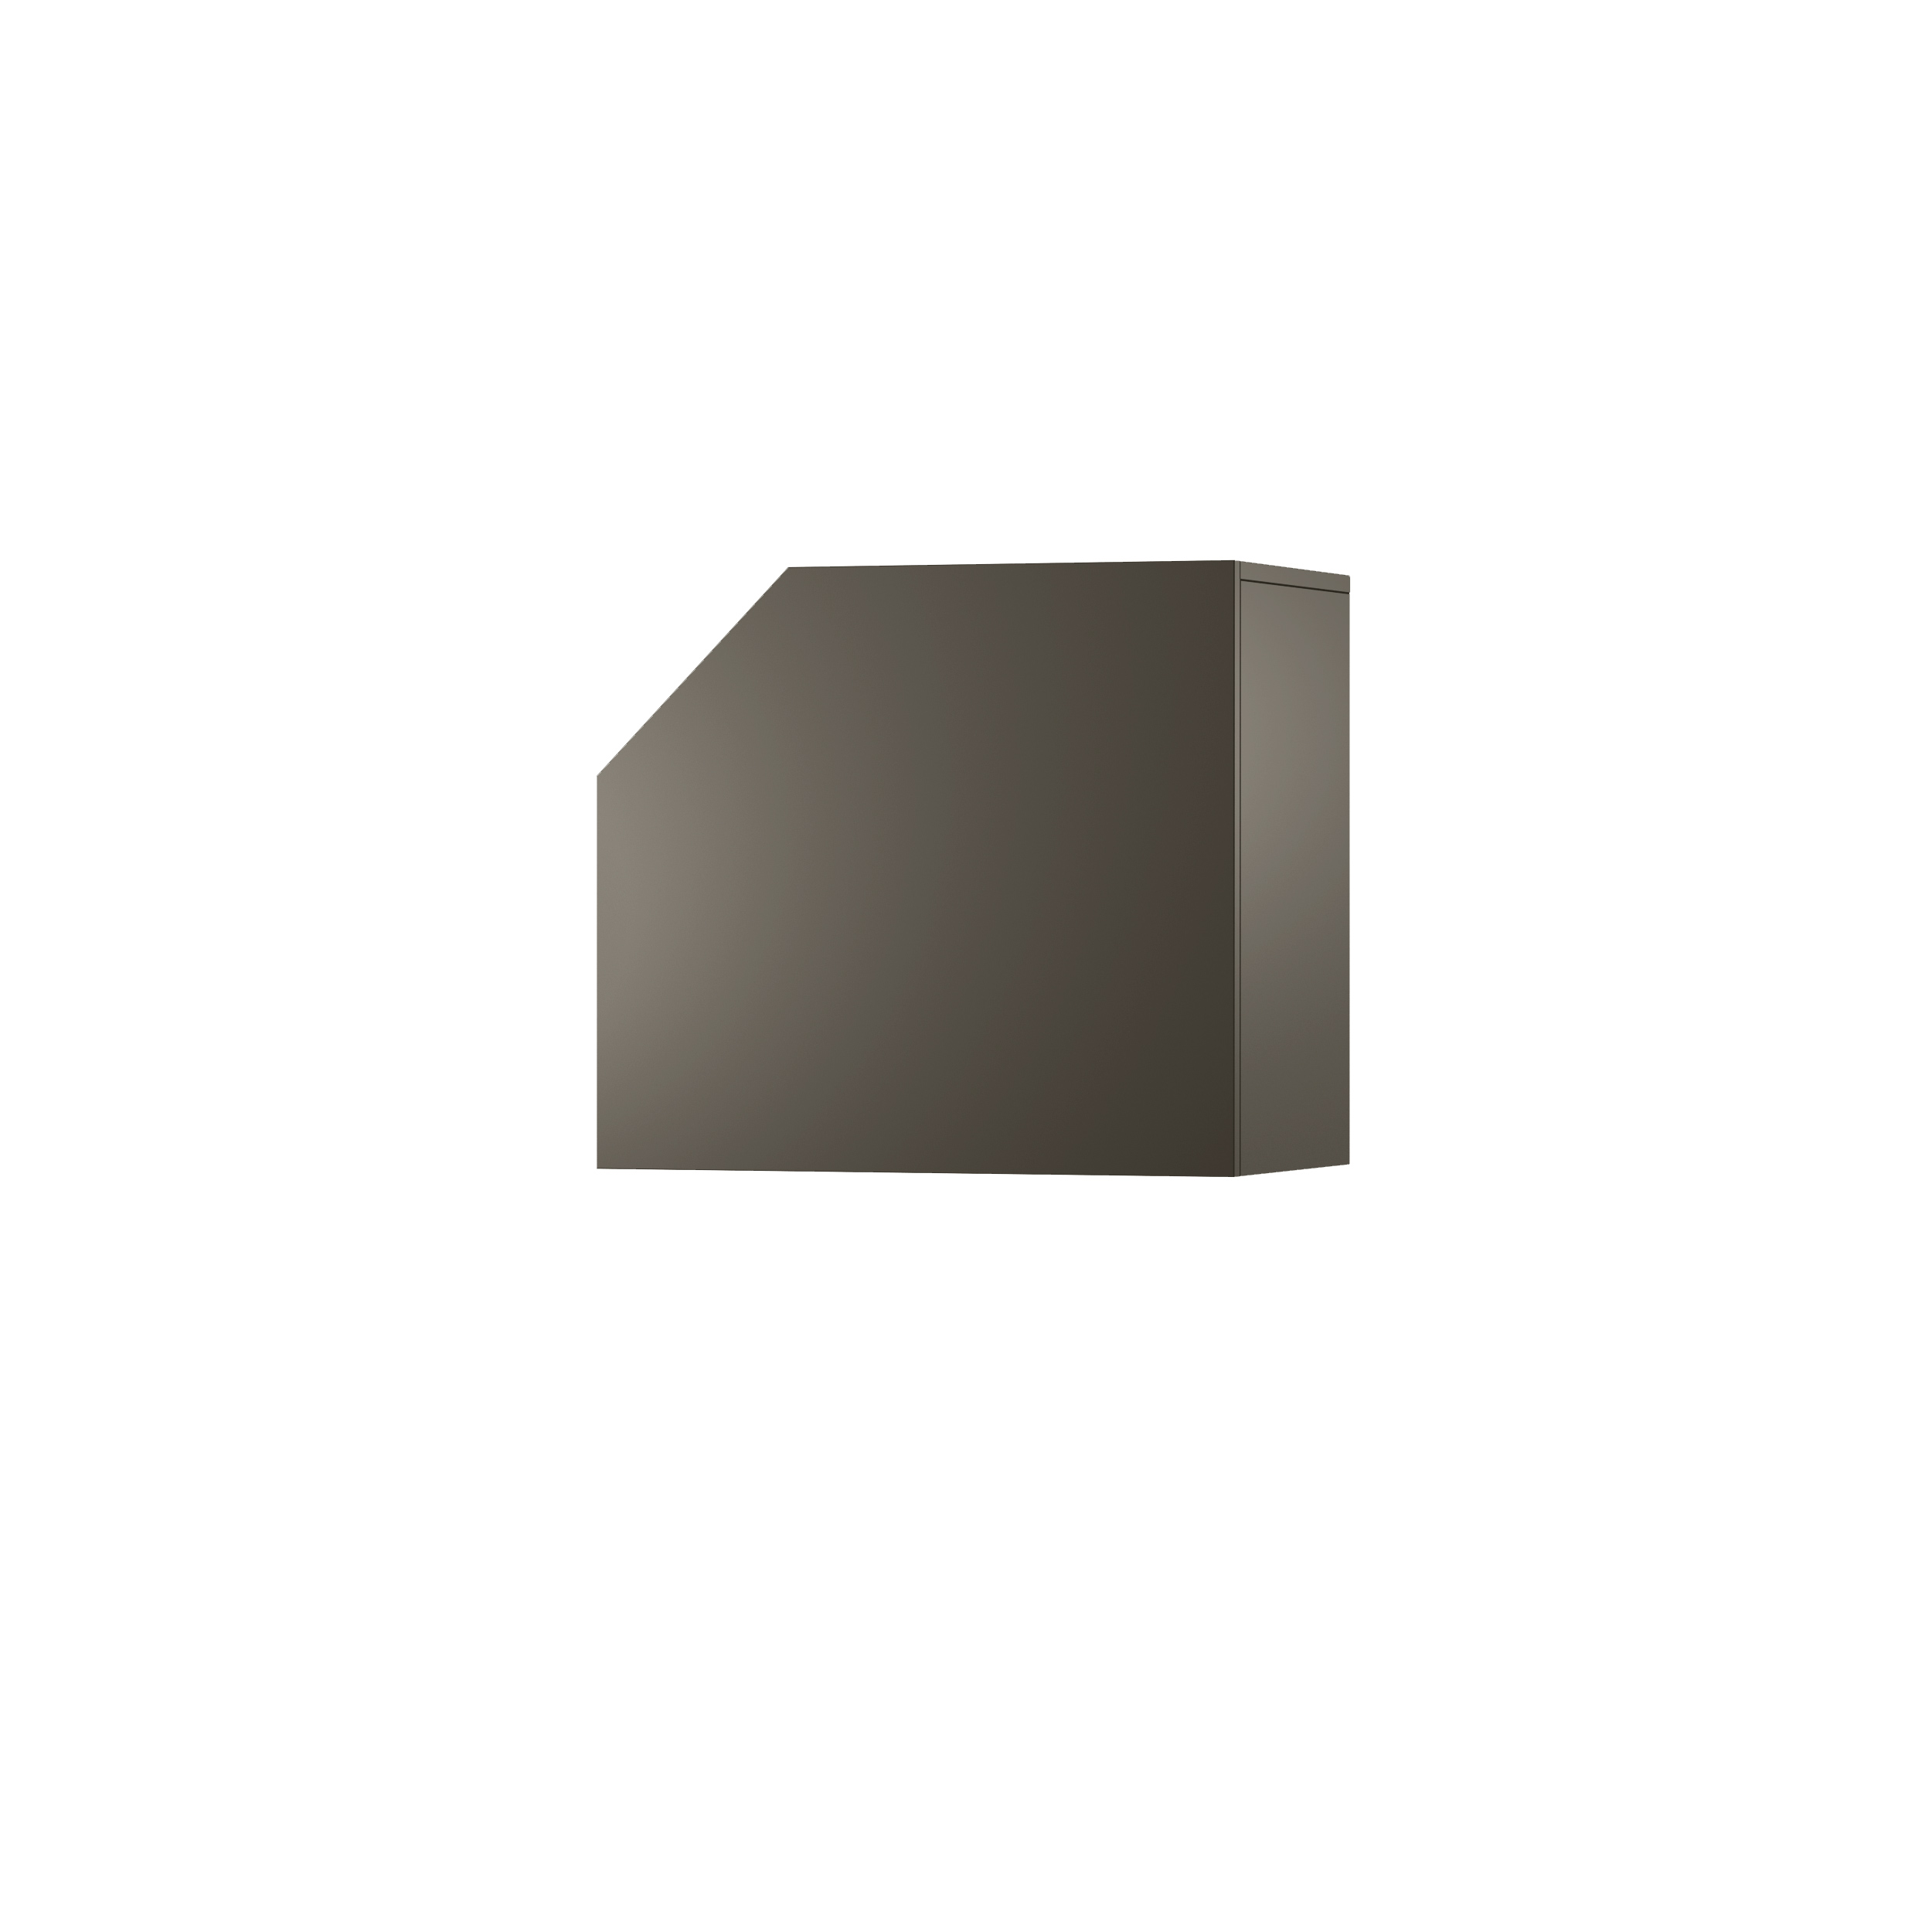 Dulap Modular Stanga Grafit - 6673